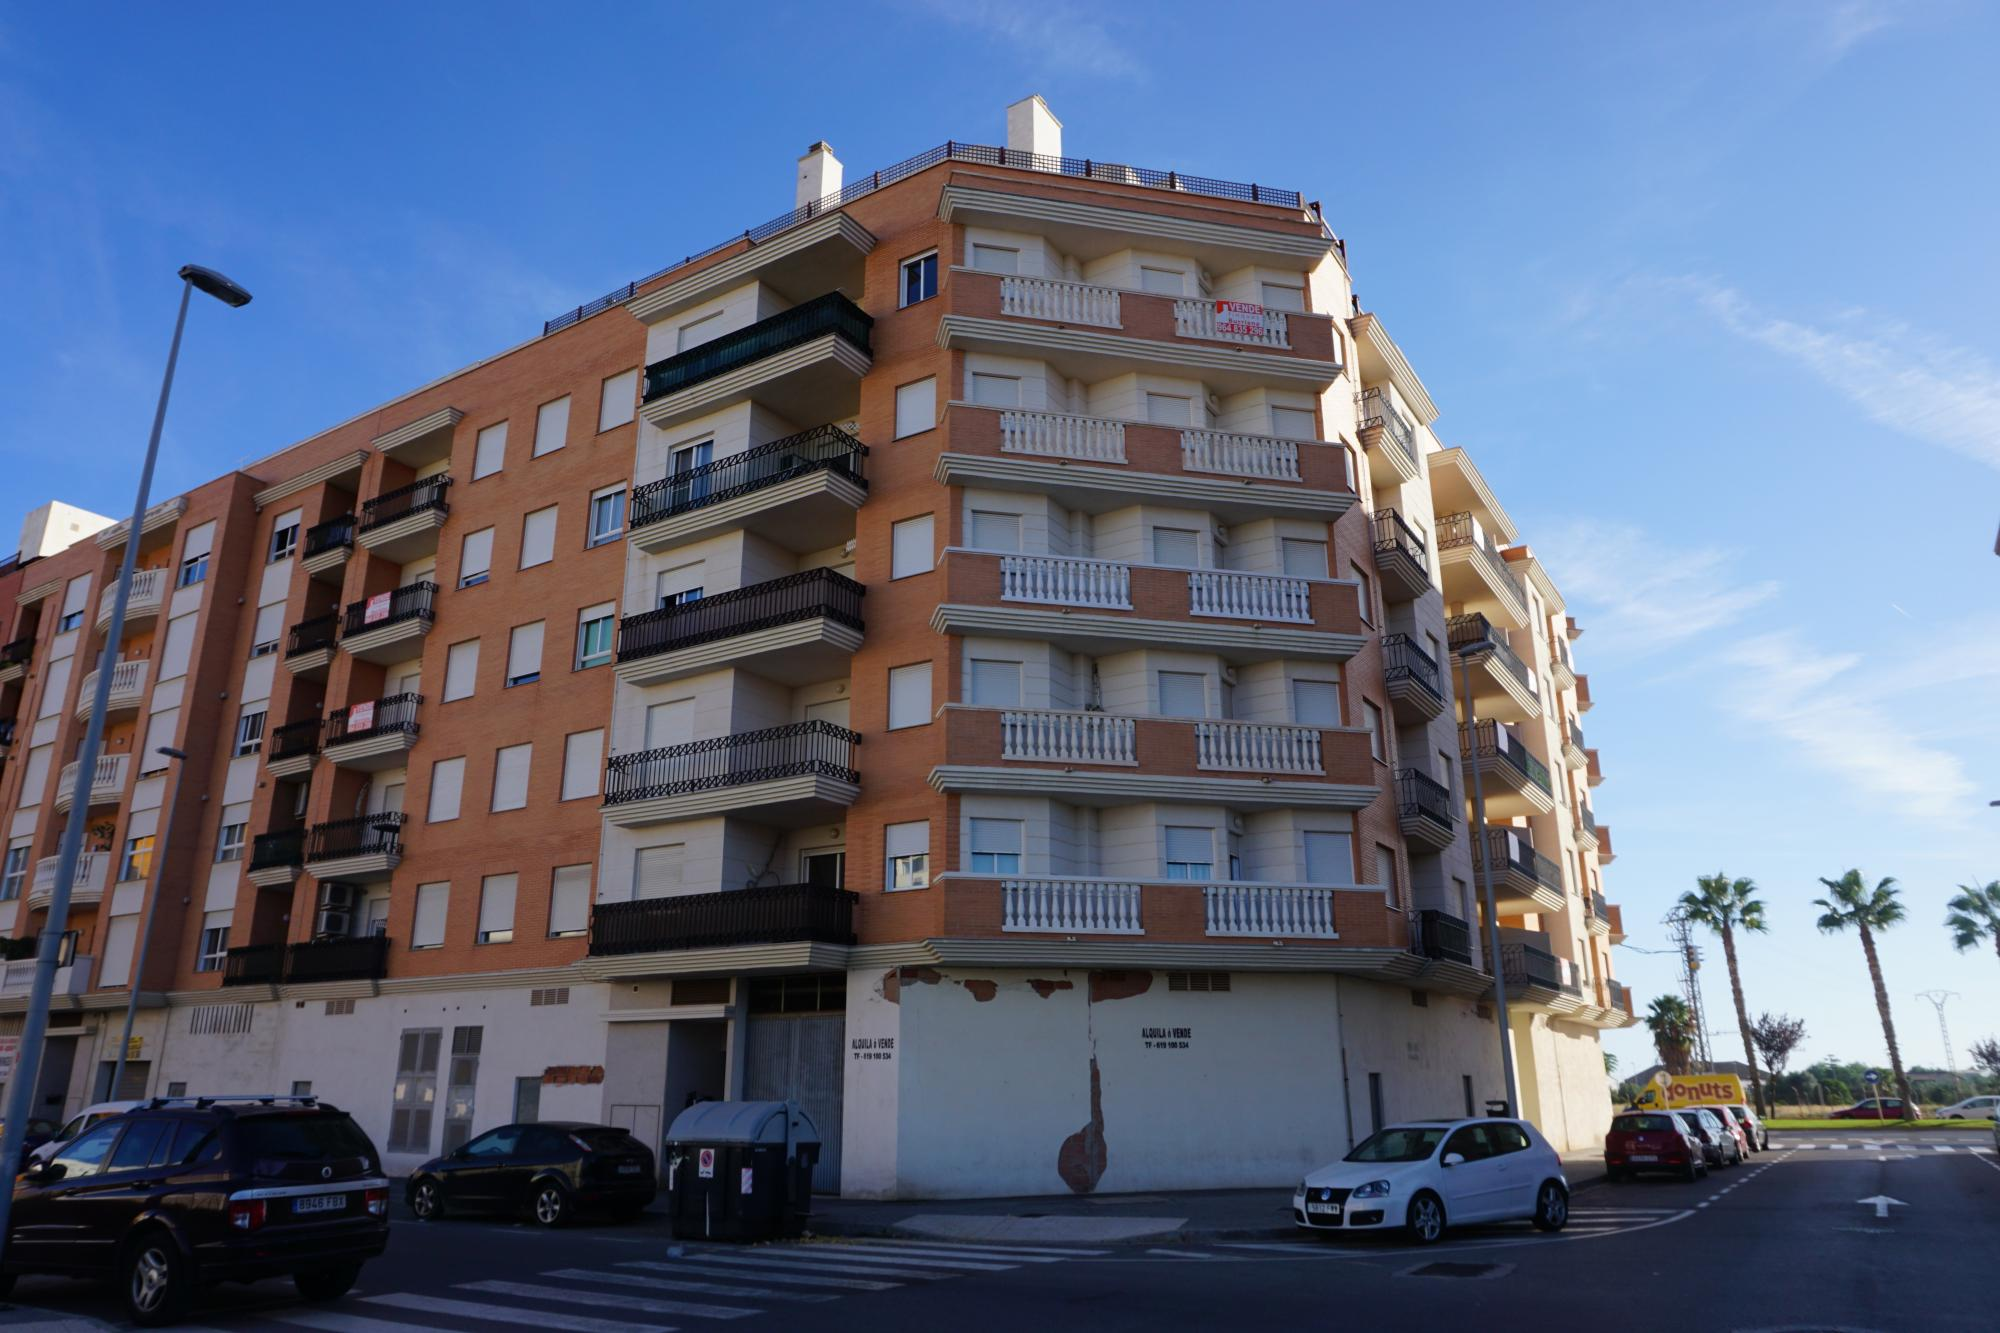 PROMOCIÓN viviendas seminuevas en Burriana (Castellón) zona LLOMBAI